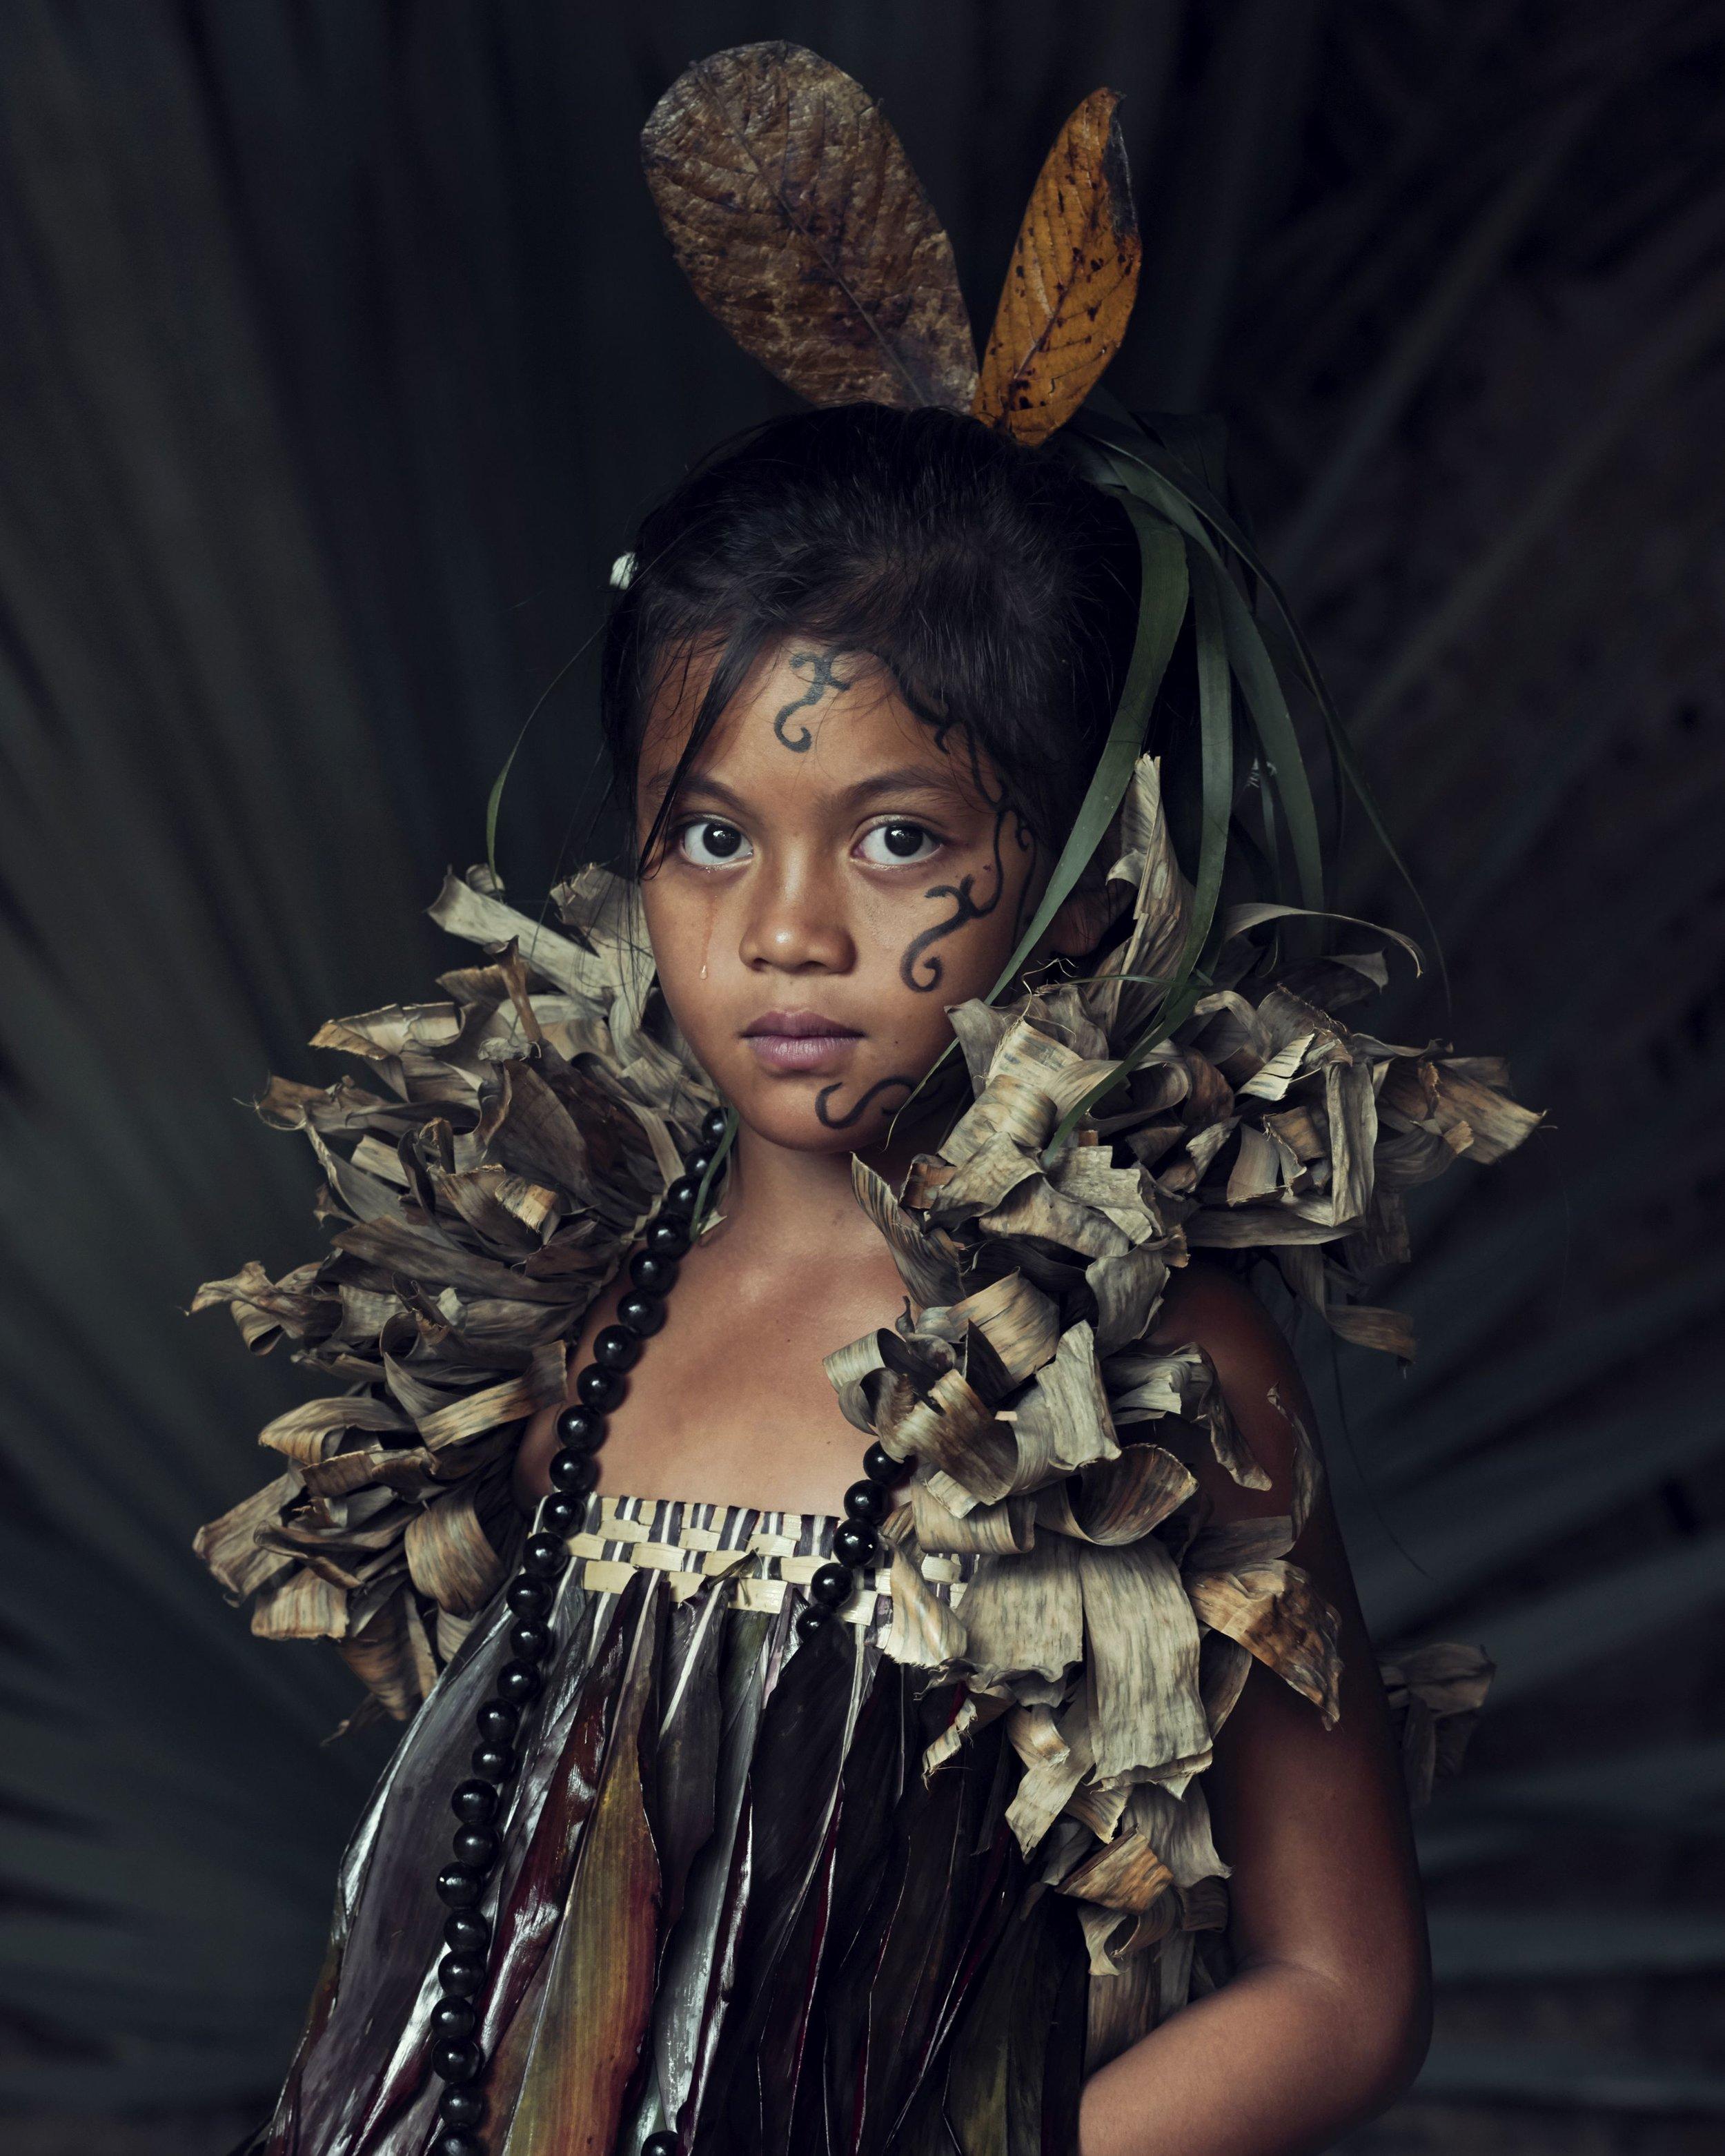 Jimmy Nelson_XXVI 2 - Te Pua O Feani, Atuona, Hiva Oa, Marquesas Islands, French Polynesia 2016.jpg